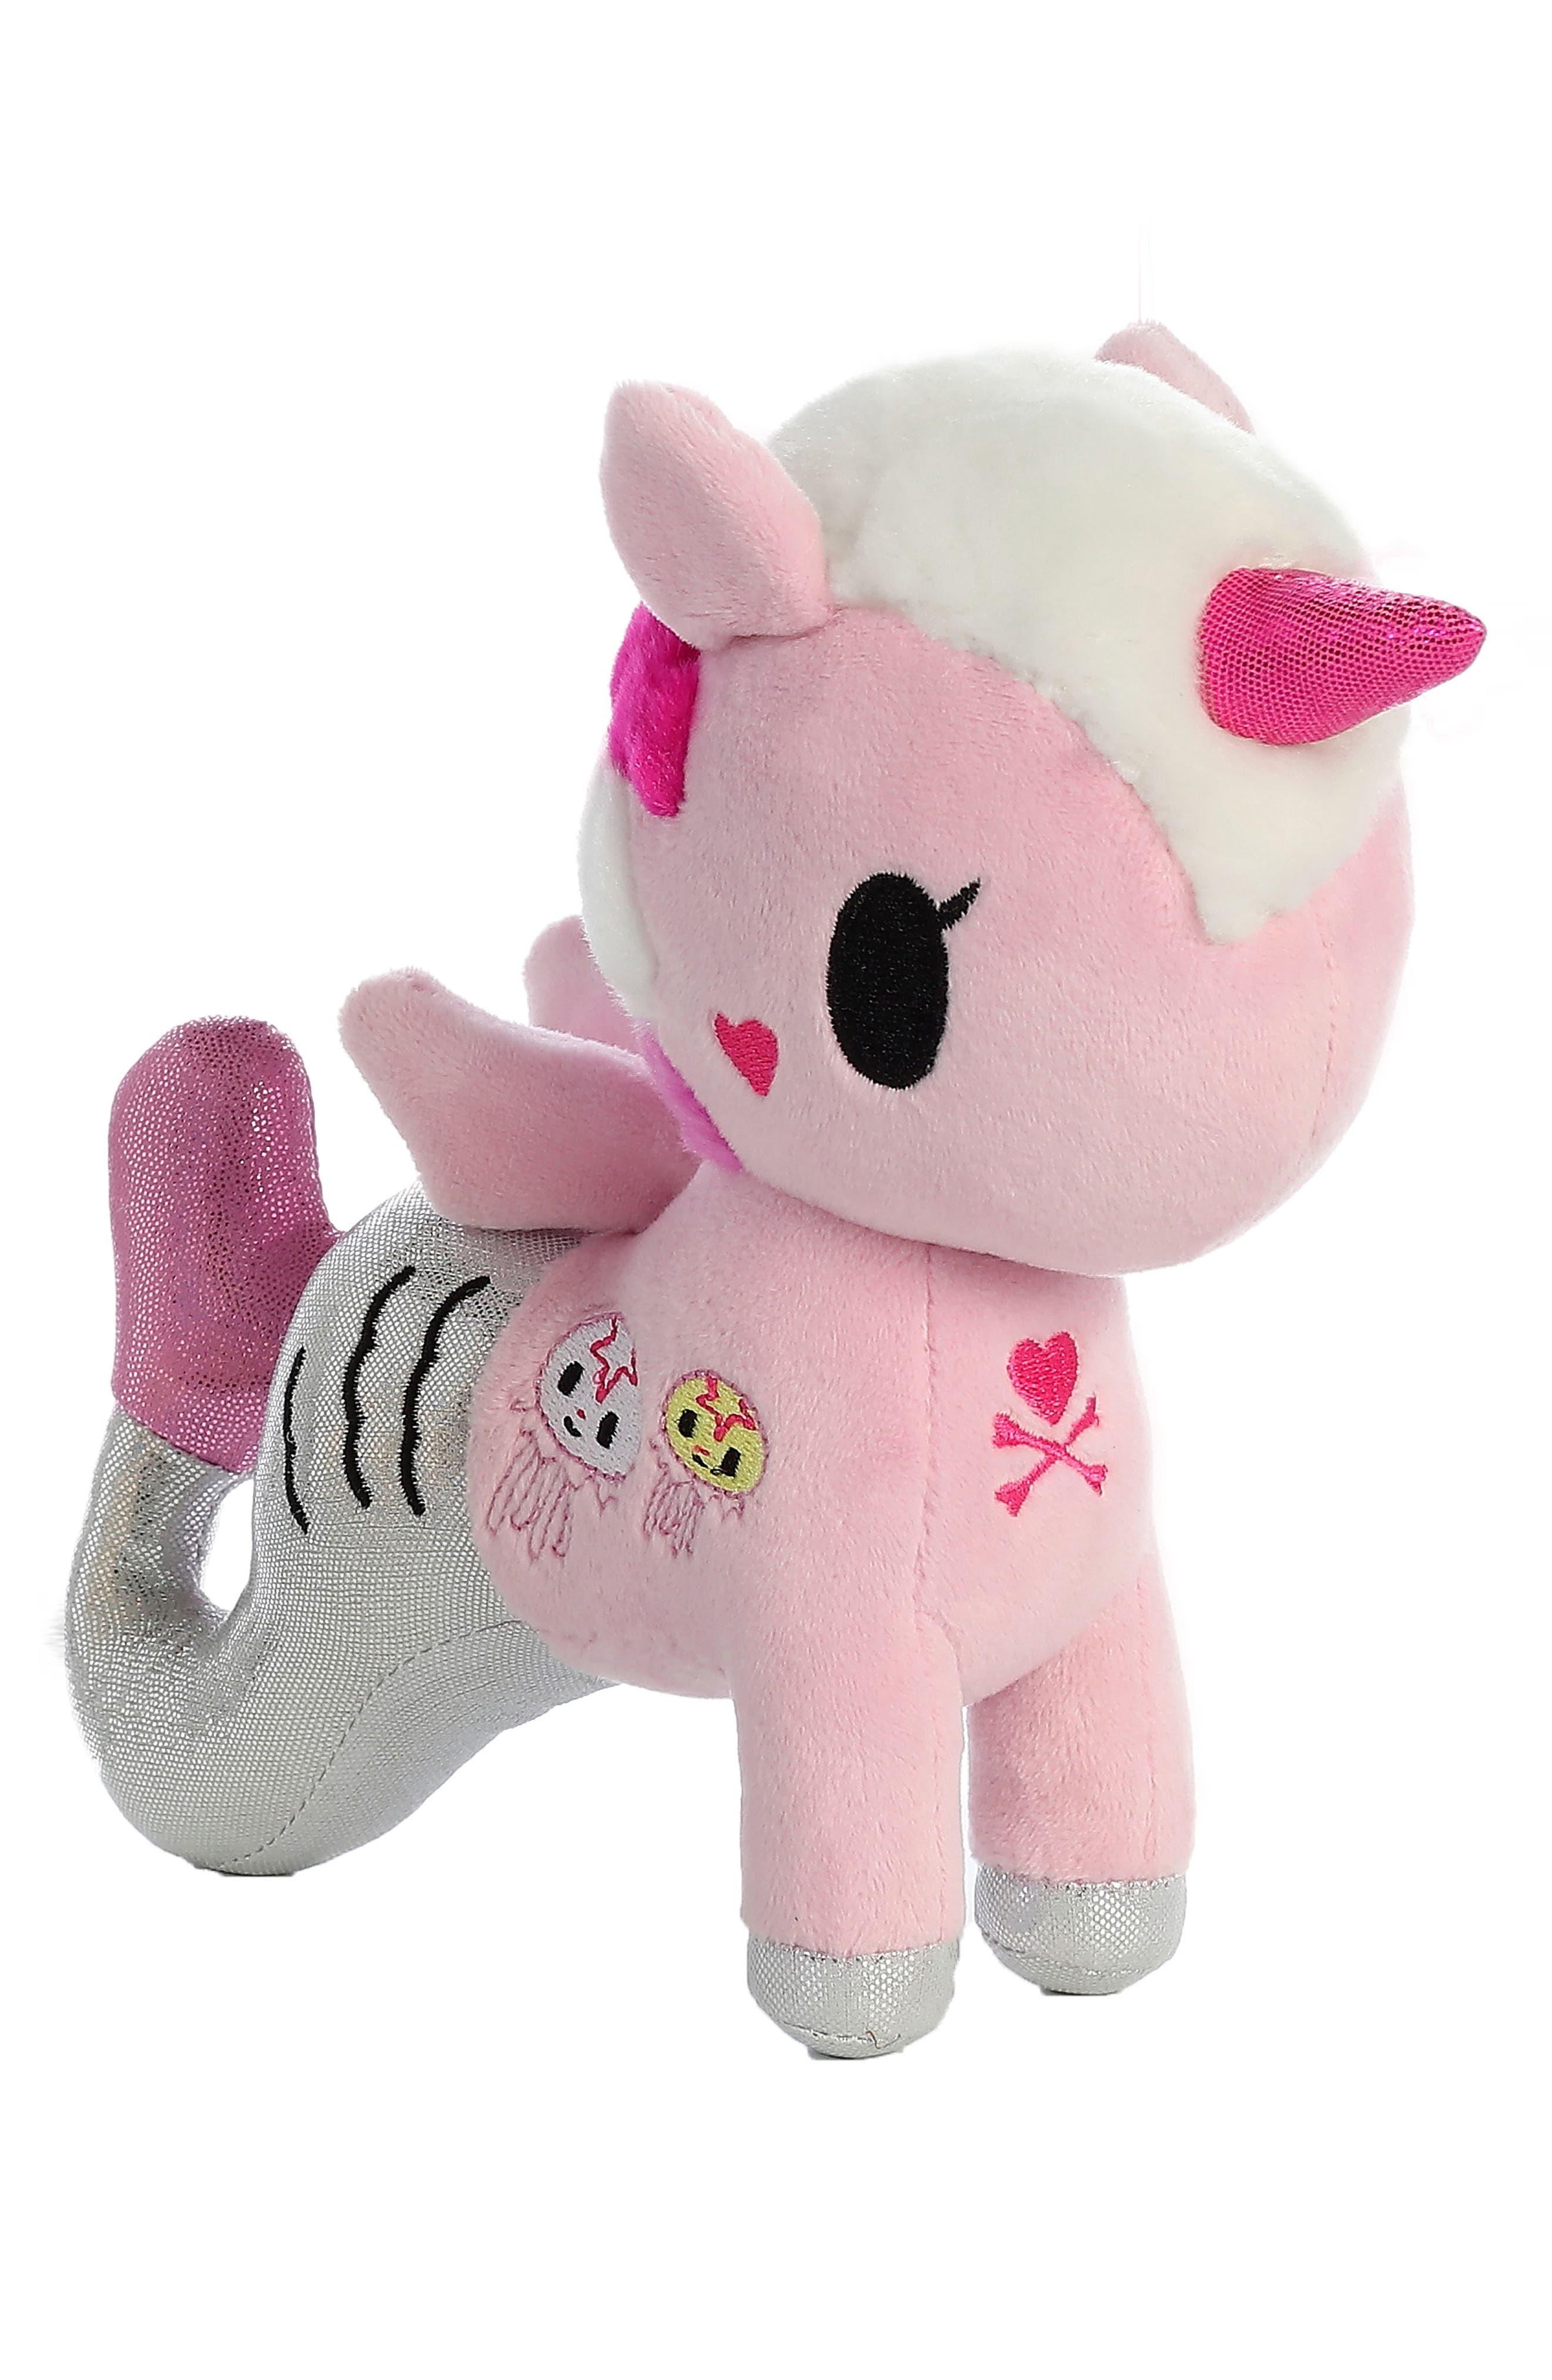 Alternate Image 1 Selected - Aurora World Toys x tokidoki Gelatina Mermicorno Stuffed Animal